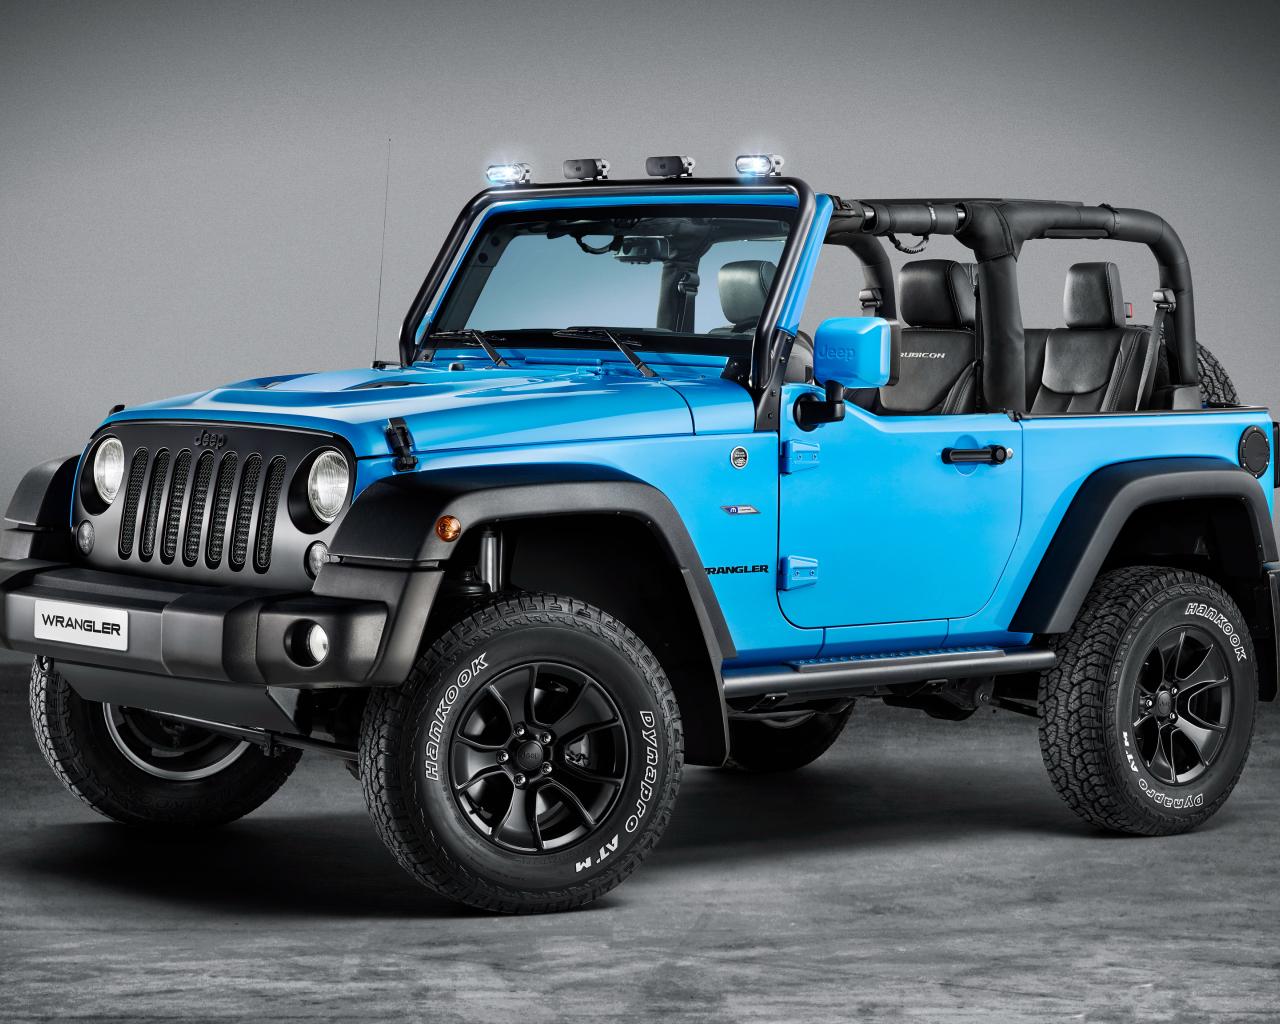 Blue Jeep Wrangler Rubicon Hd 4k Wallpaper